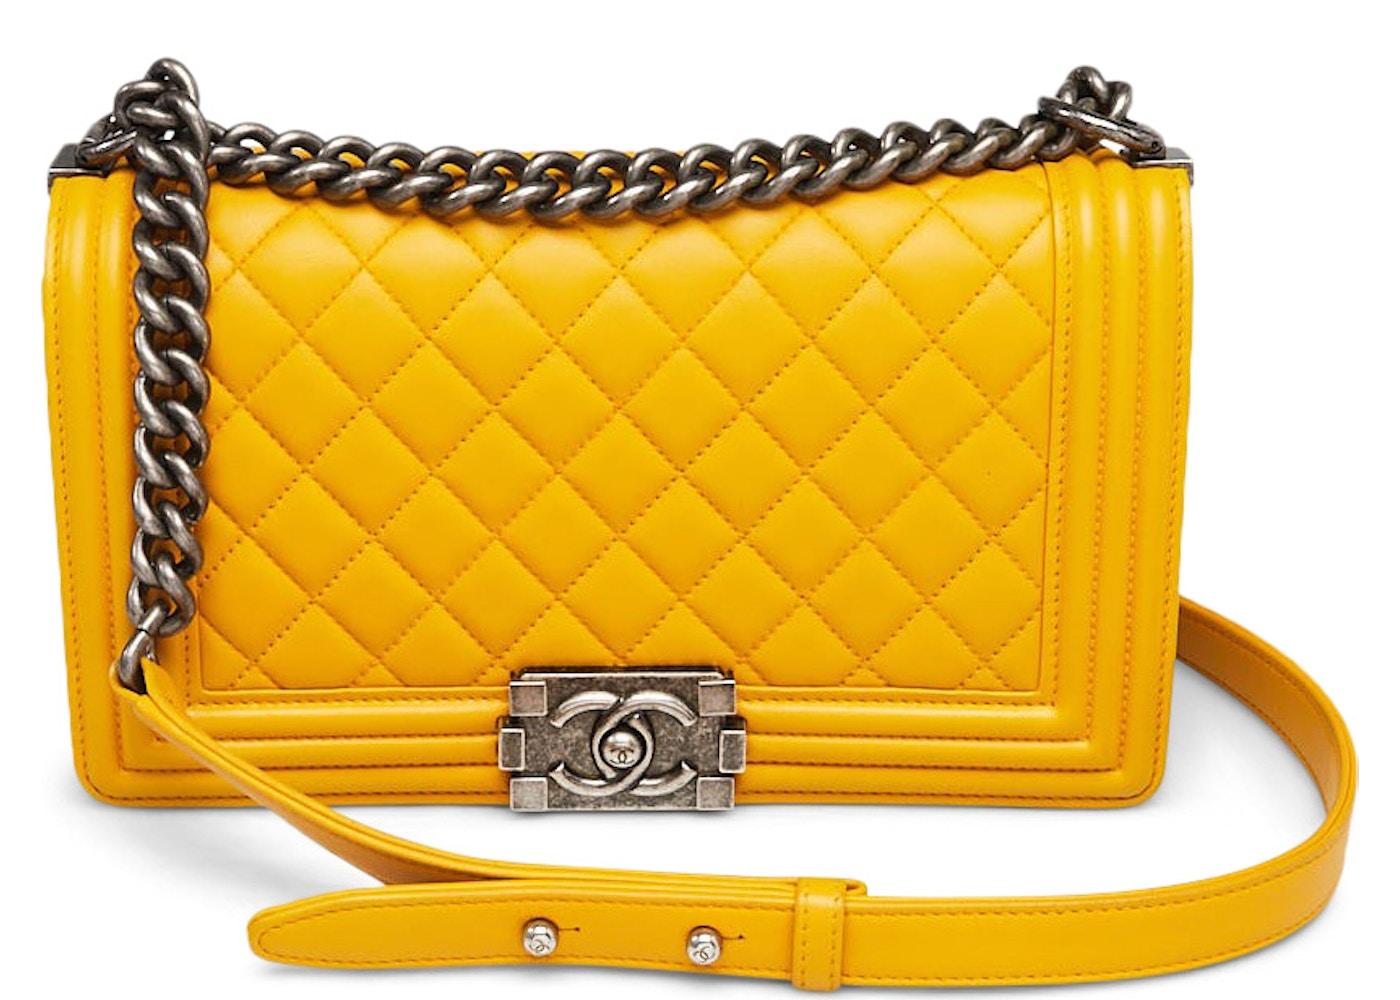 b664a936d29880 Chanel Boy Flap Quilted Diamond Medium Yellow